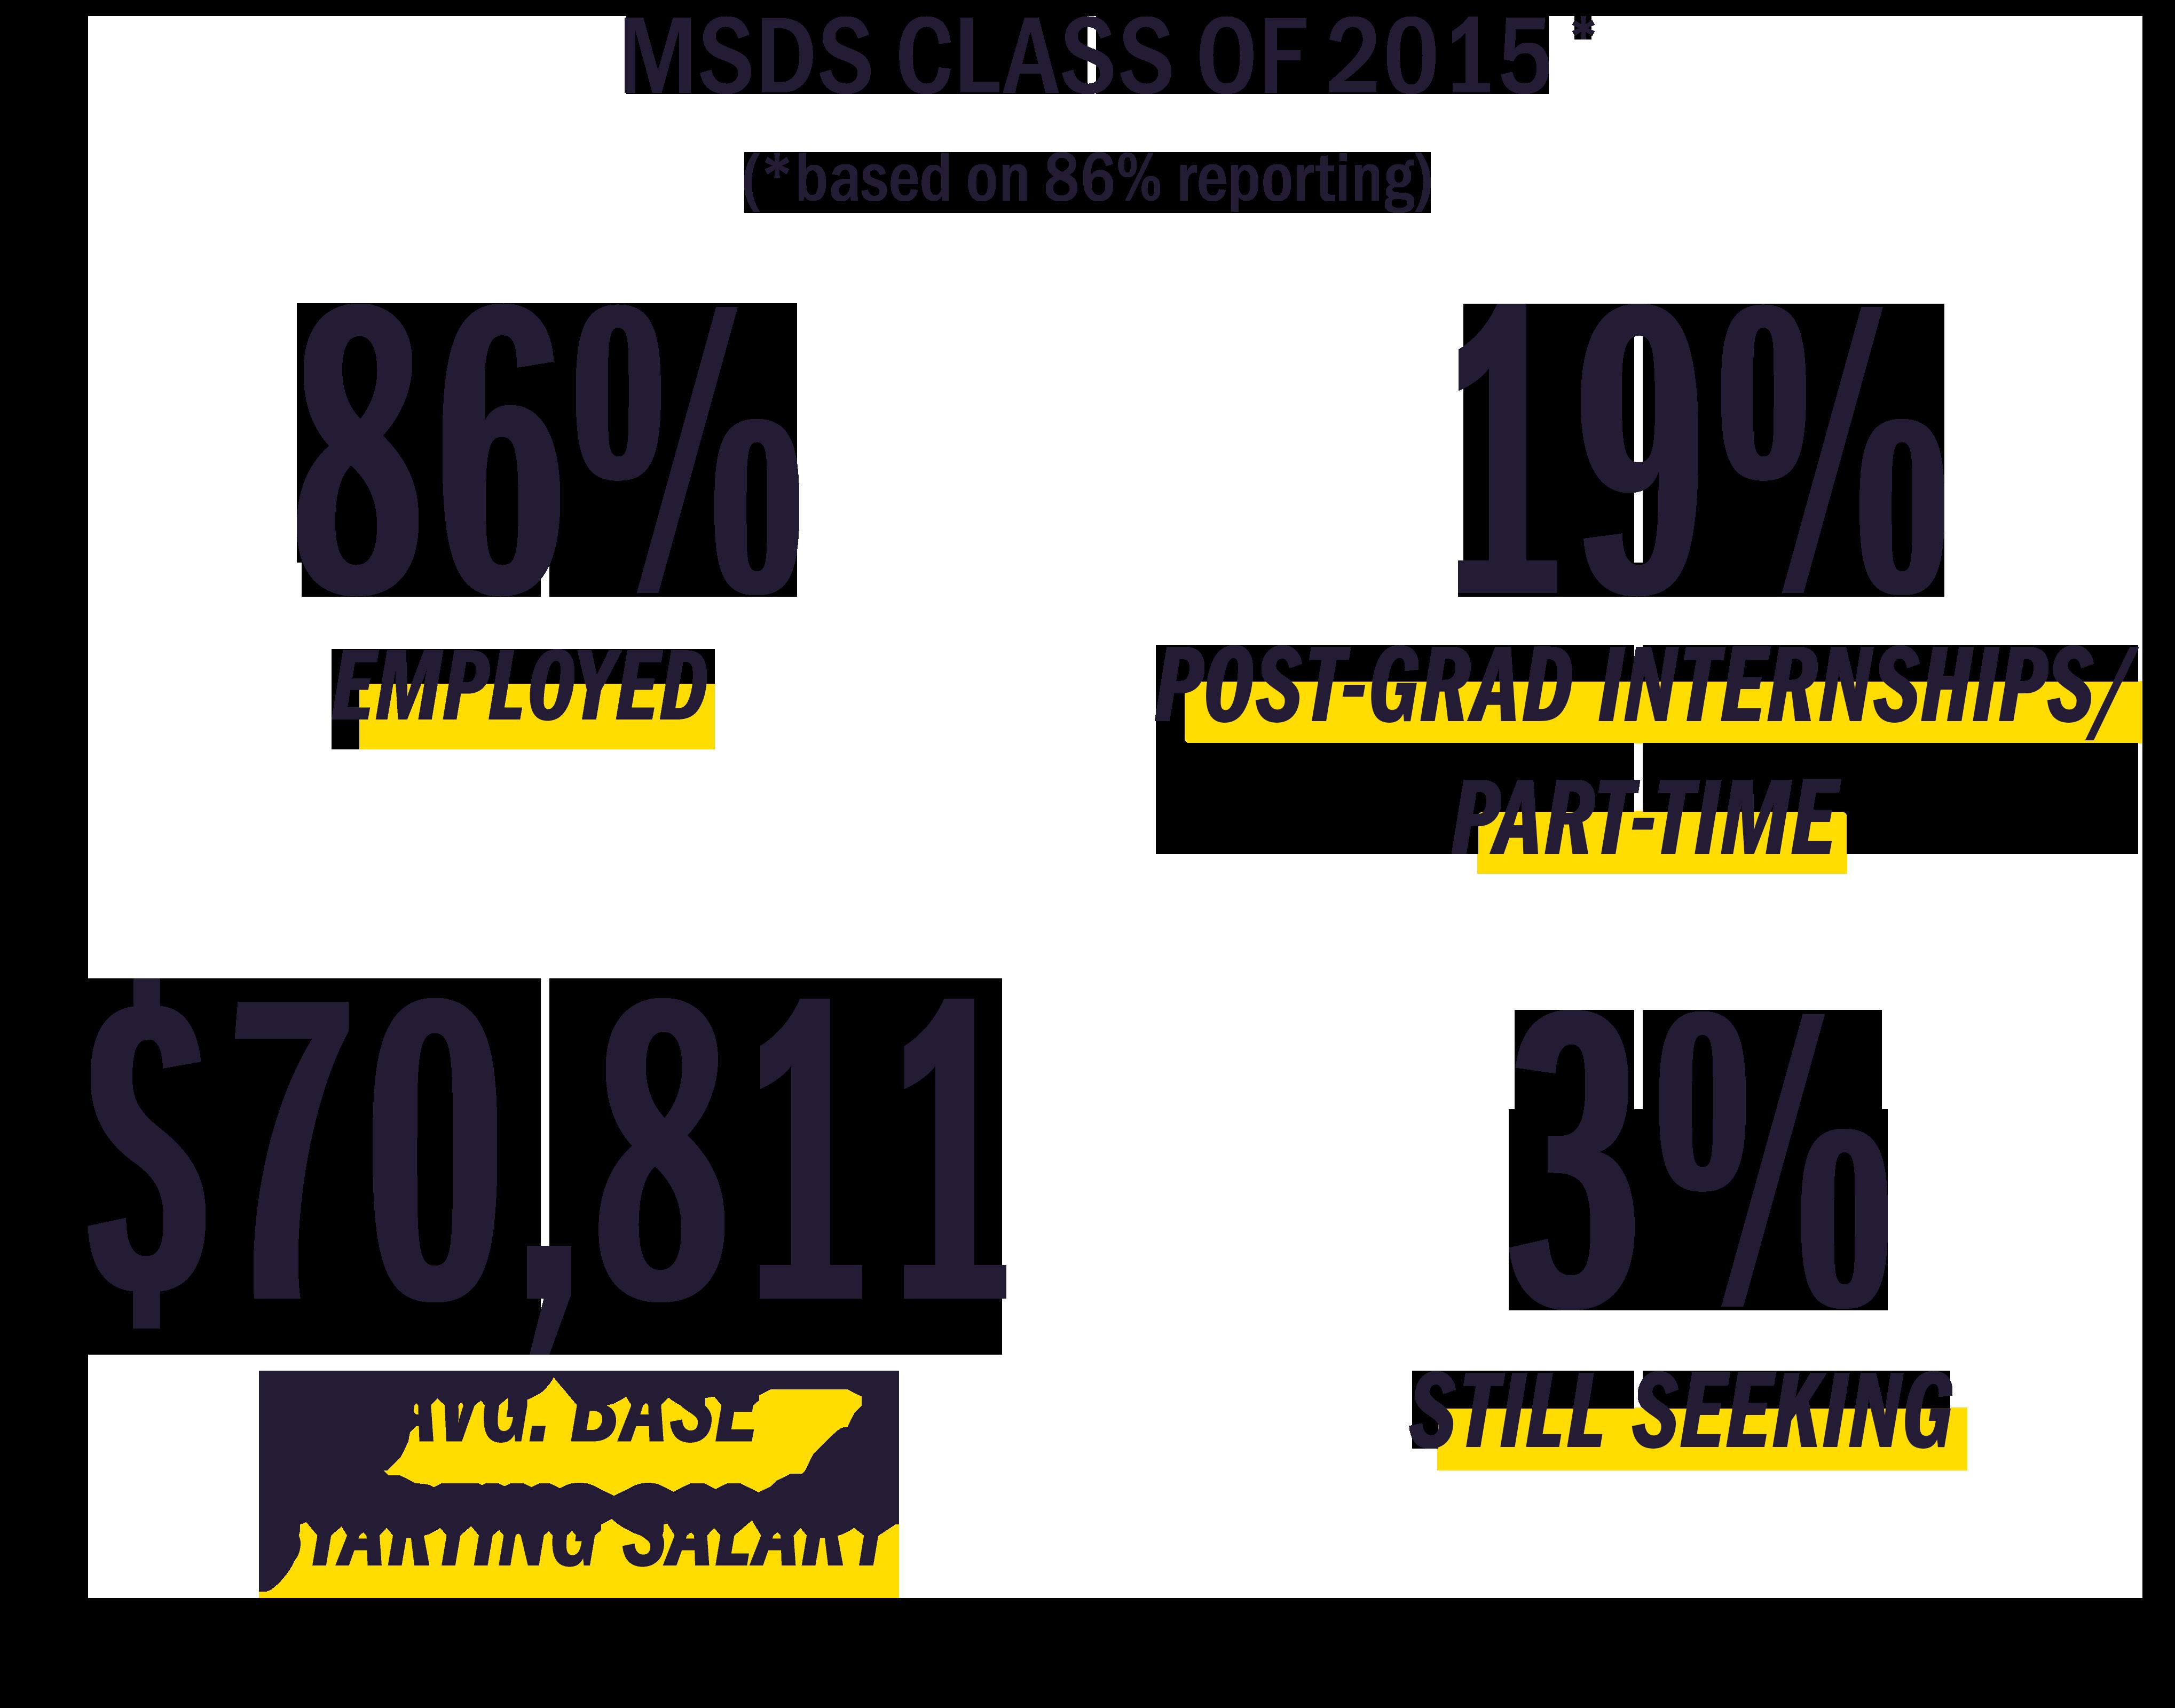 2015 Placement Statistics